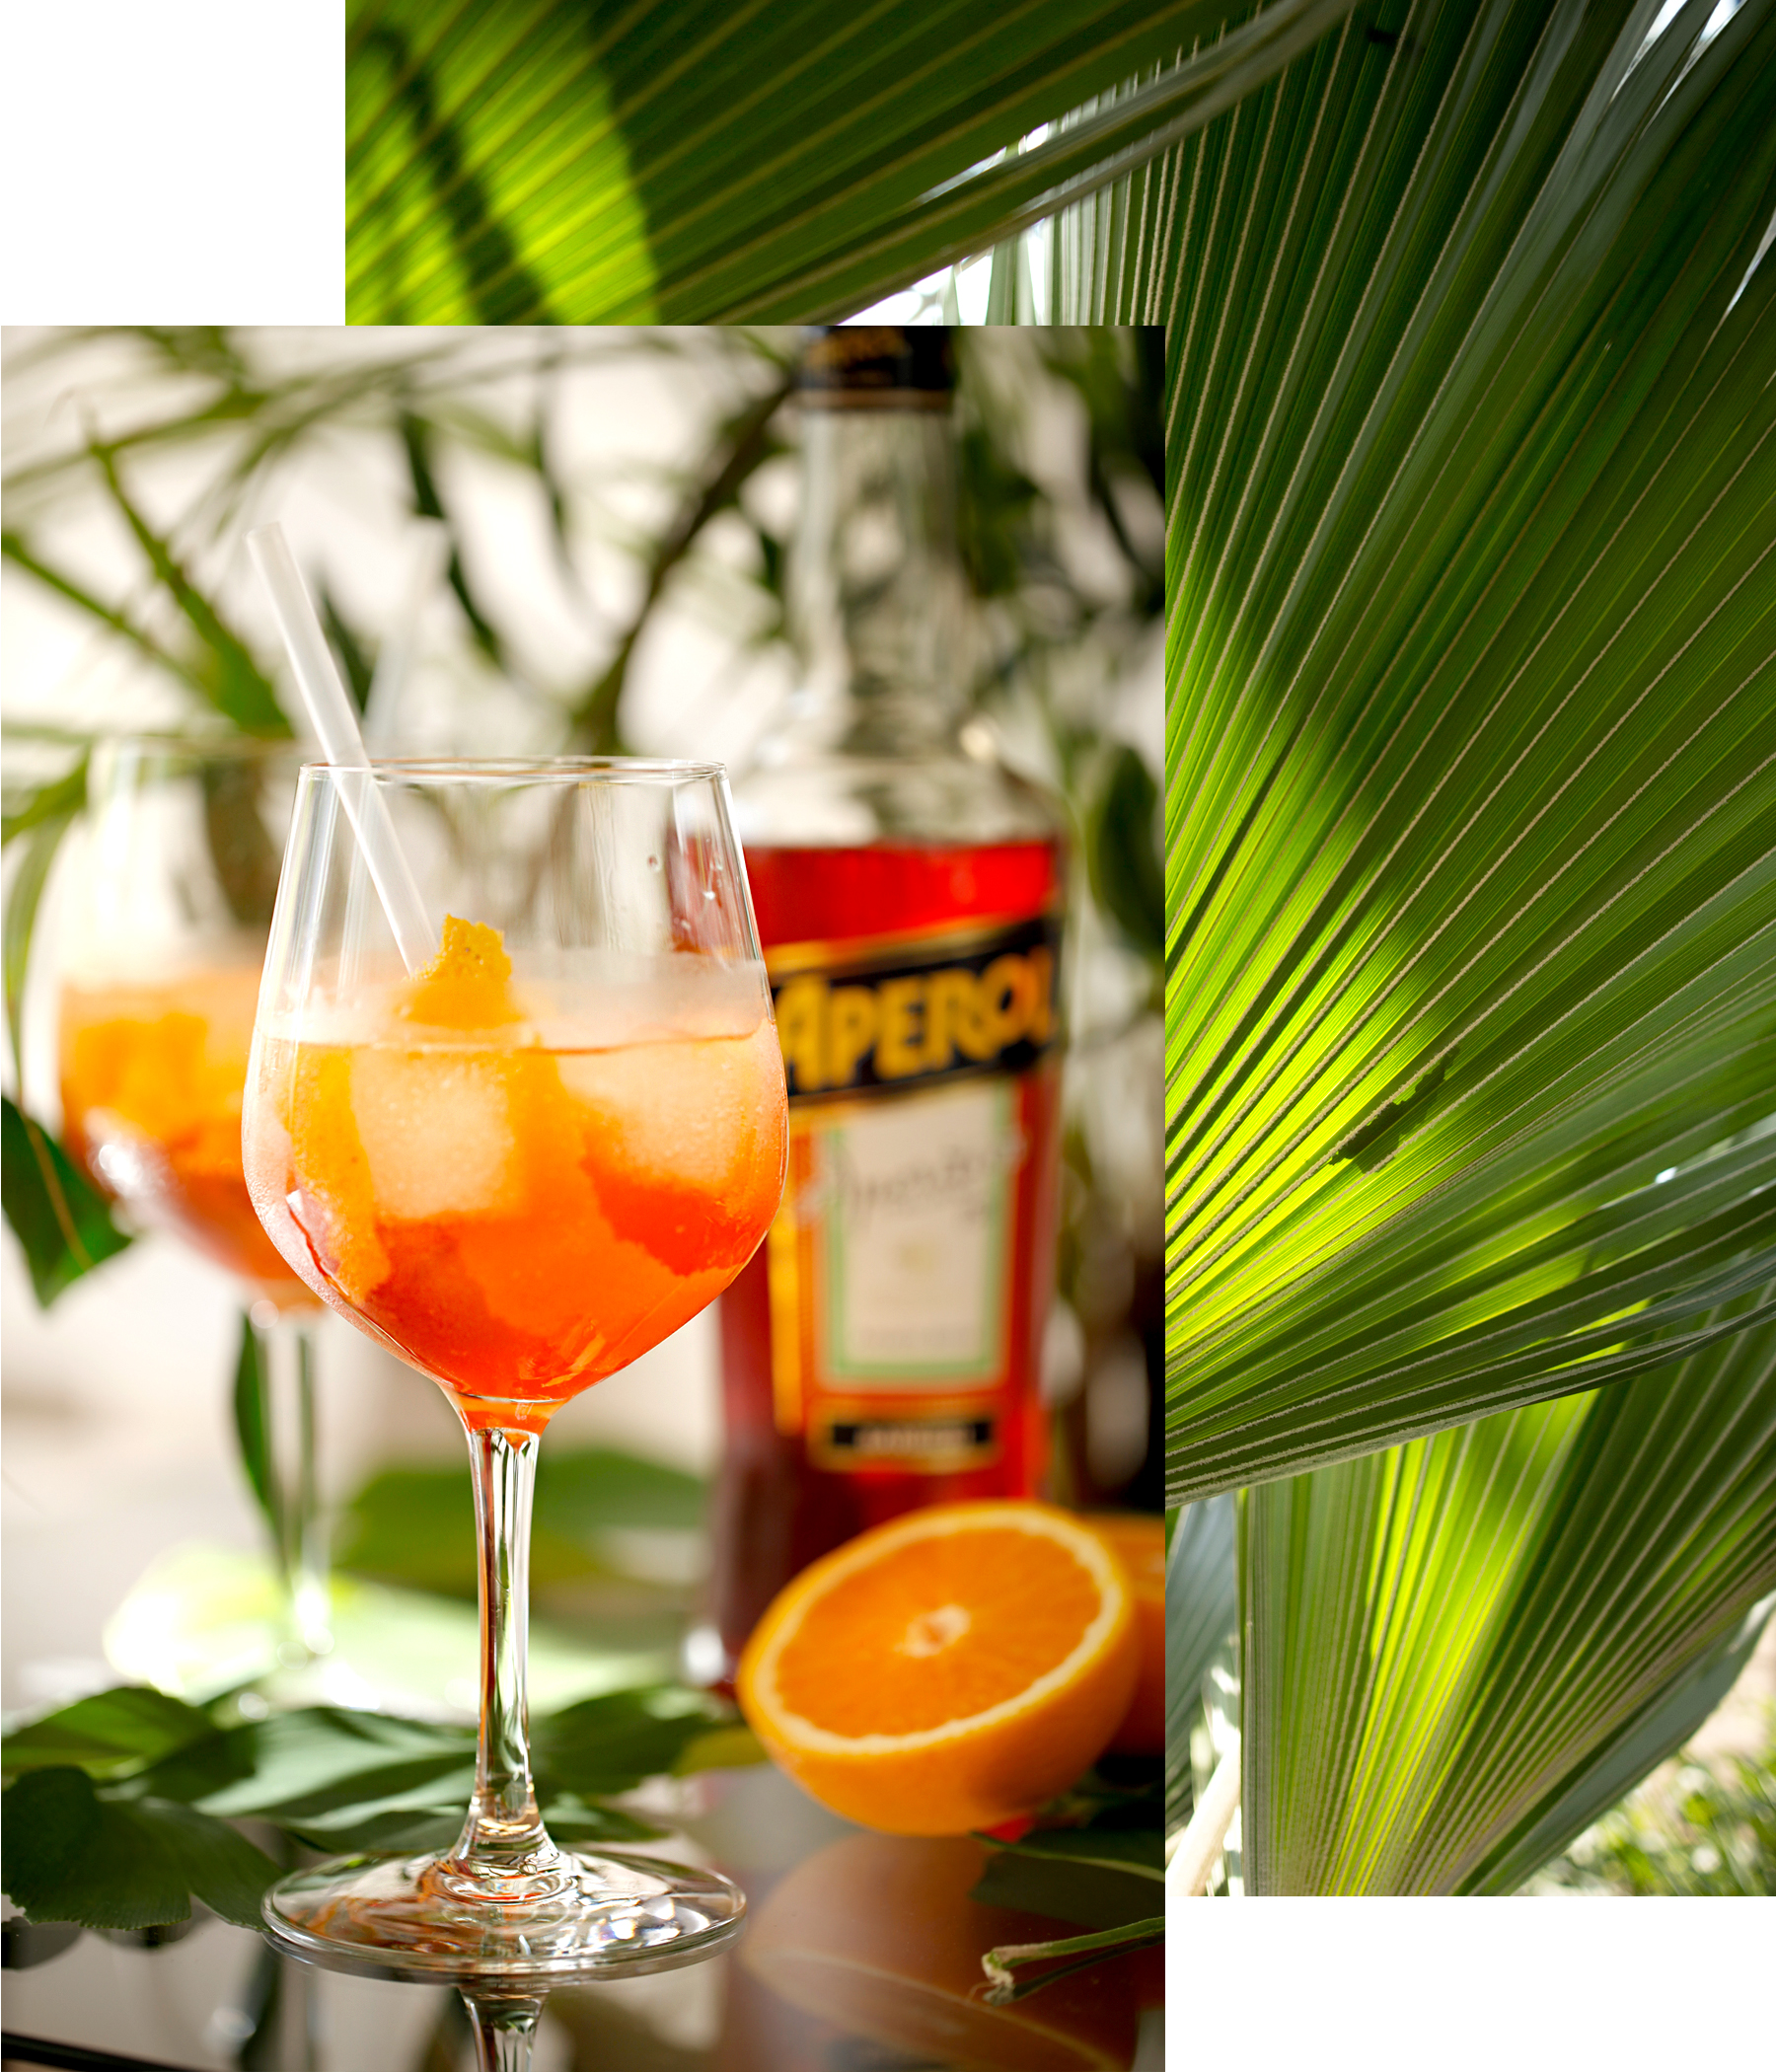 aperol spritz summer aperitif drink cocktail recipe personal urban jungle garden palm tree holiday feeling white crochet dress hm gucci belt saint laurent wedges dionysus ricarda schernus fashionblogger 4